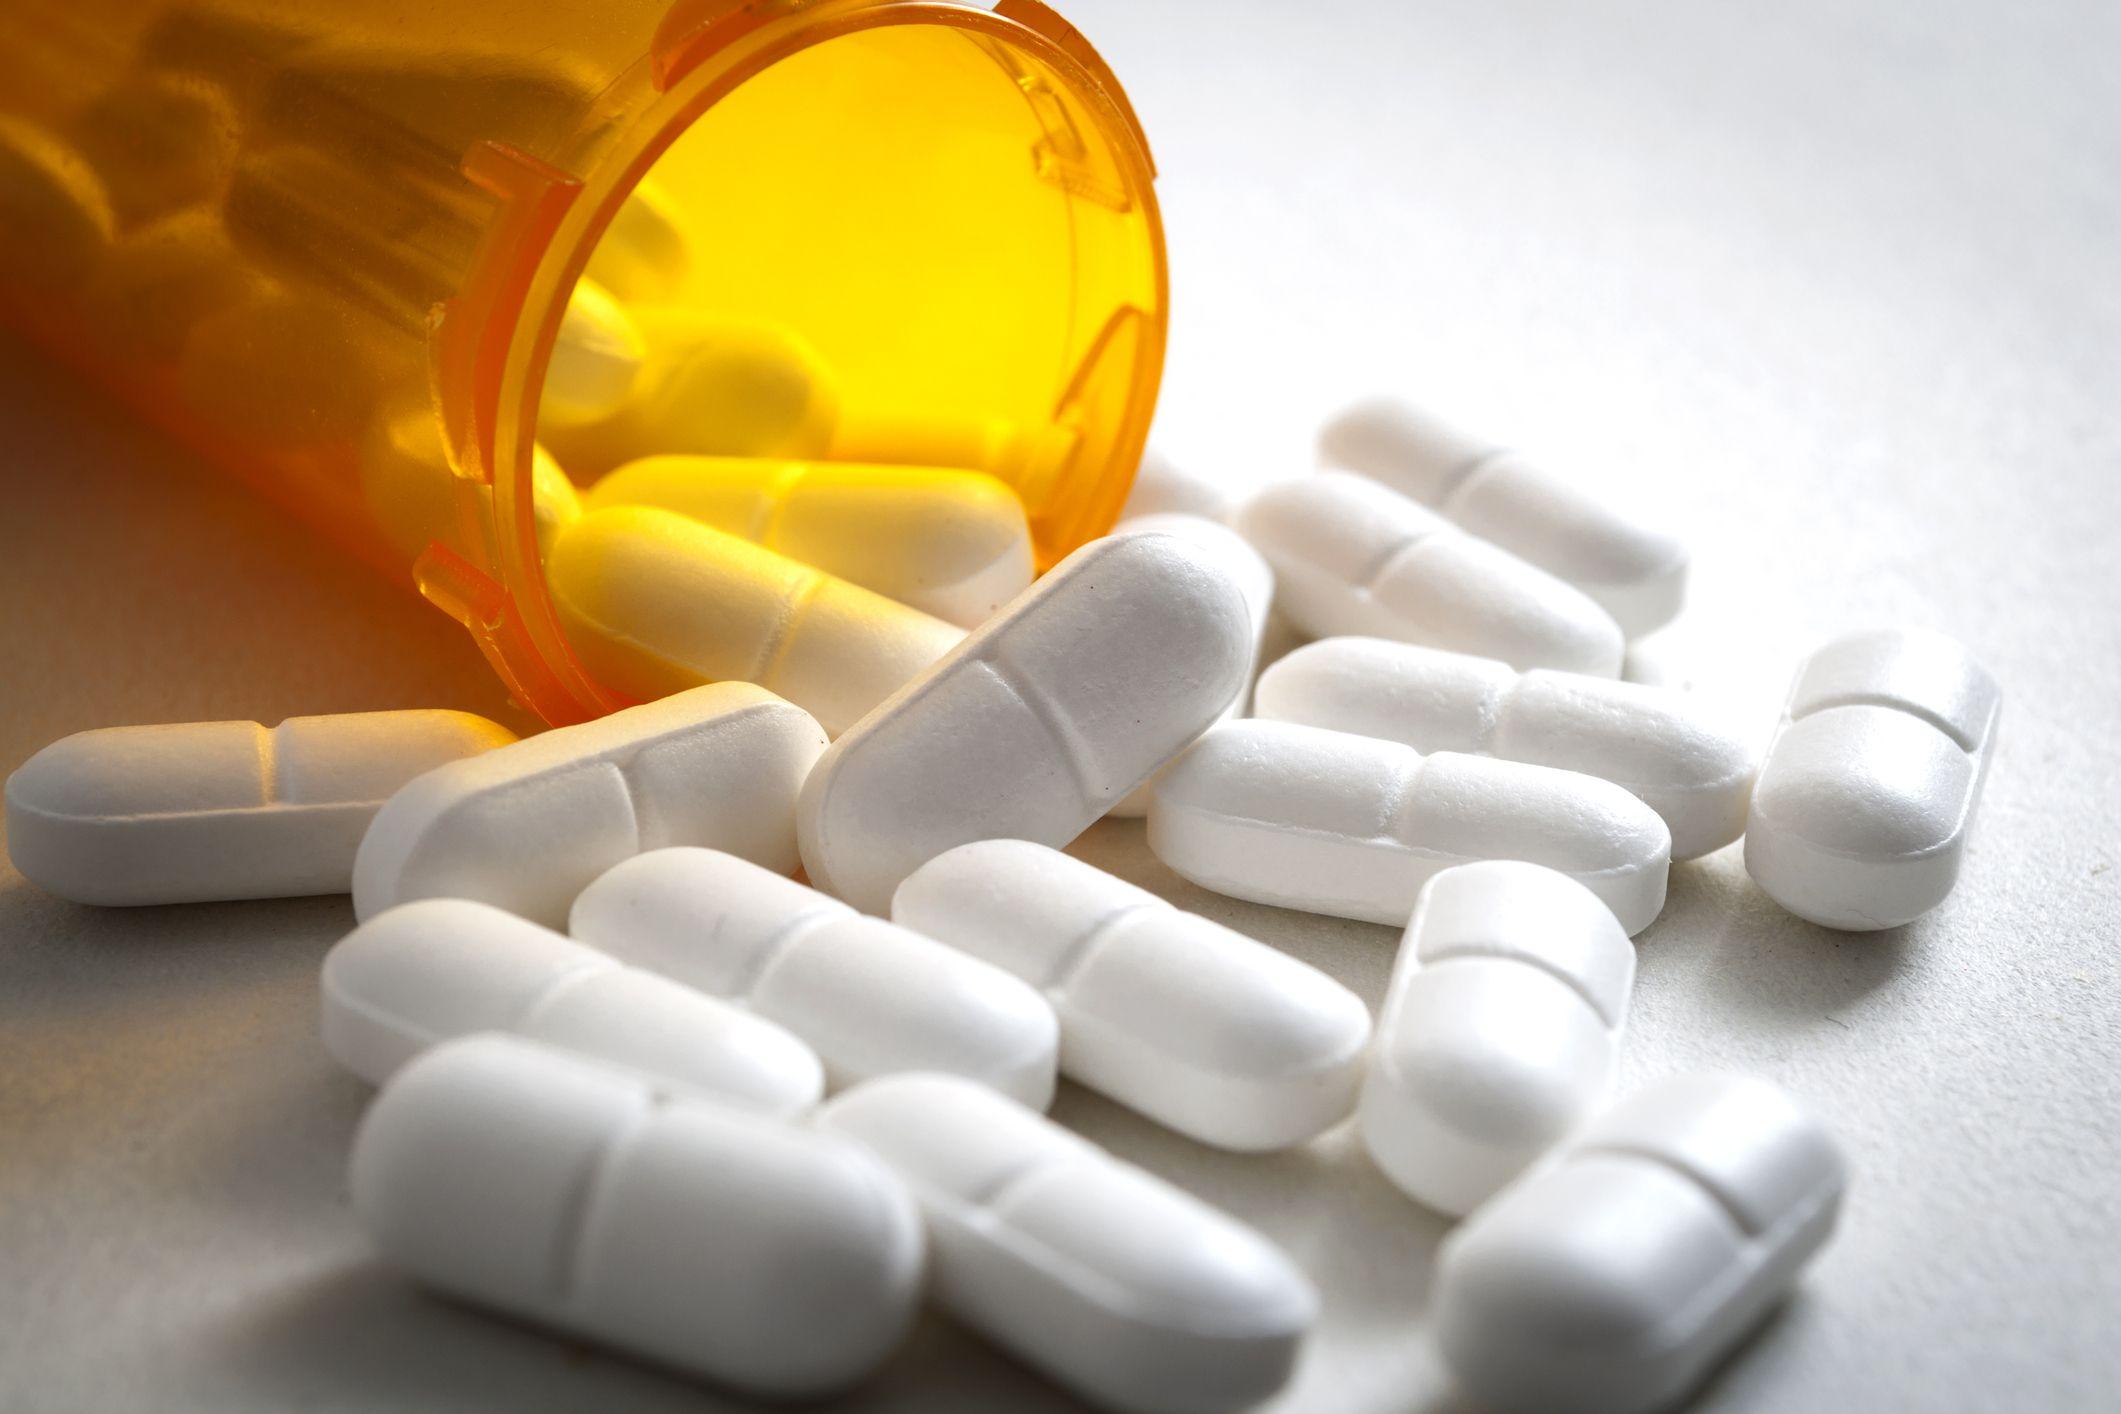 opioid drug stock getty